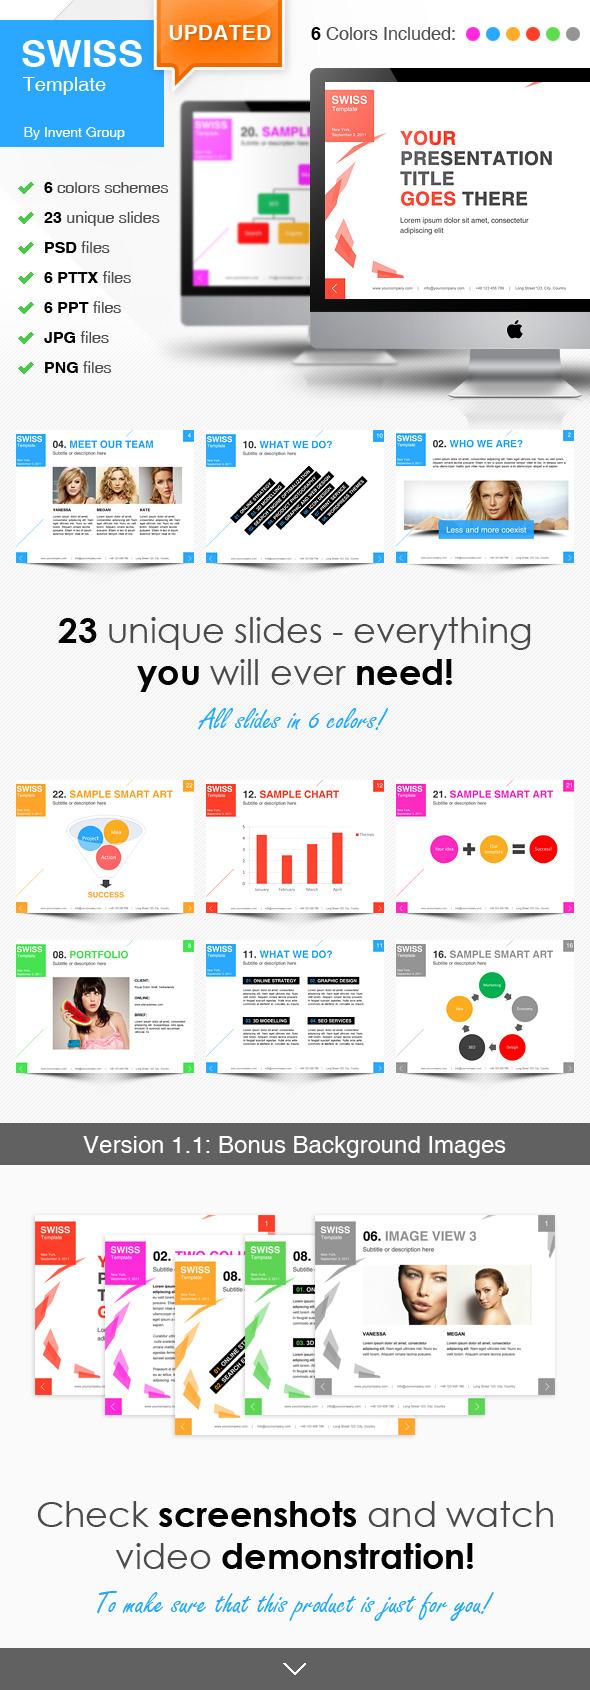 Swiss Idea Template - PowerPoint Templates Presentation Templates